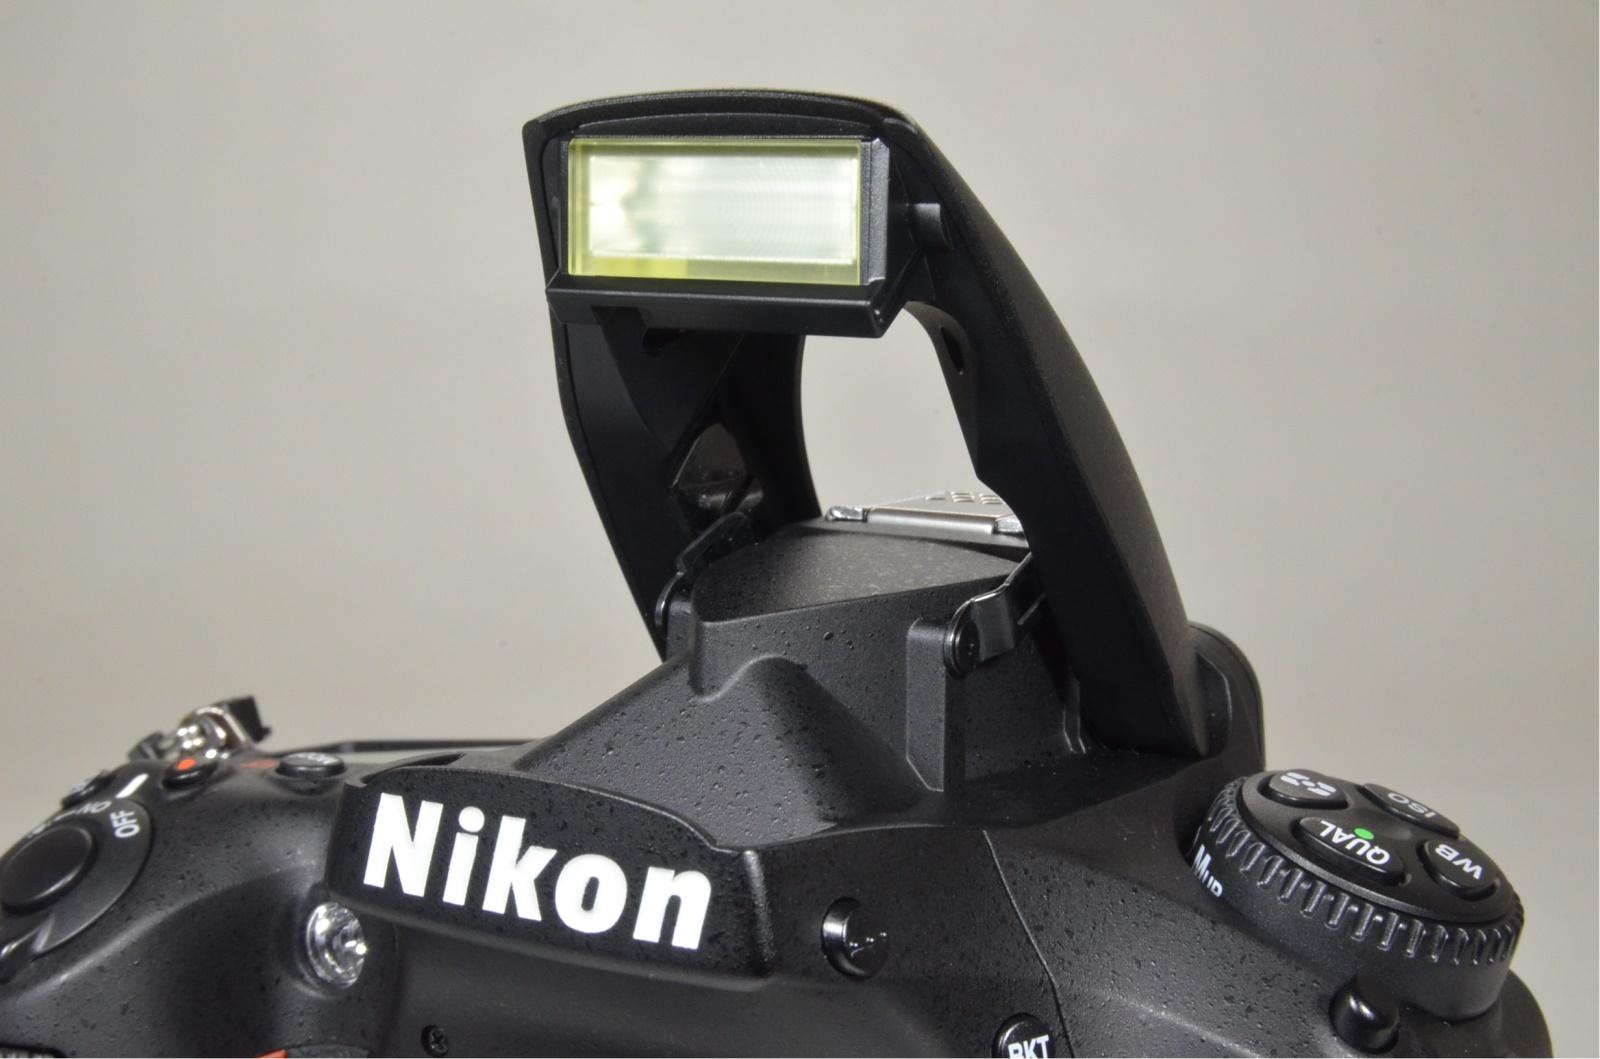 nikon d810 36.3mp digital slr camera body shutter count 8345 from japan